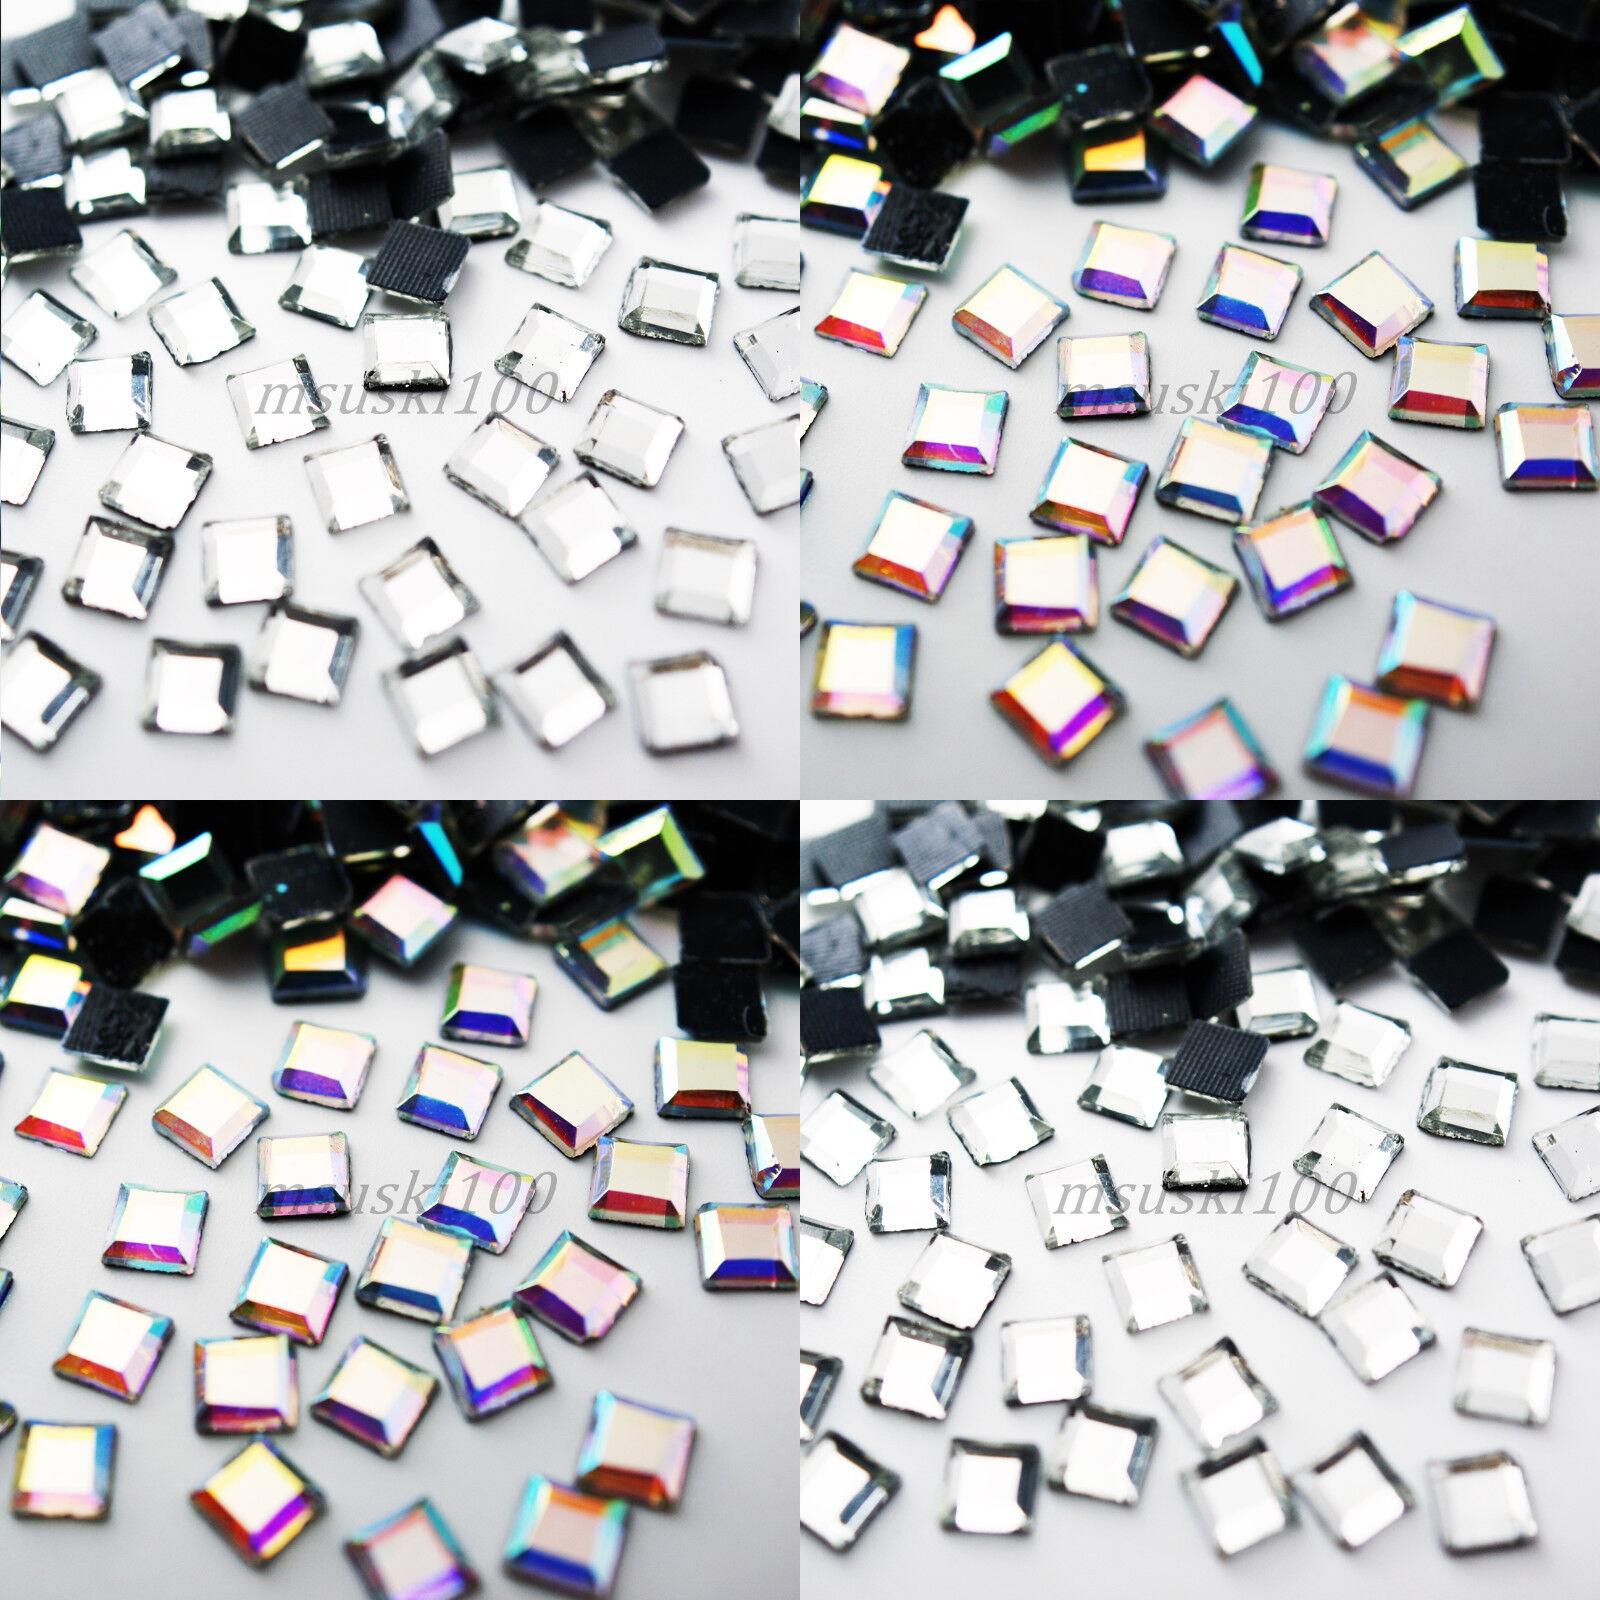 89cb8d3fbd Details about SQUARE Hotfix Rhinestones Crystal Glass Gems Iron on Transfer  Glue Flatback